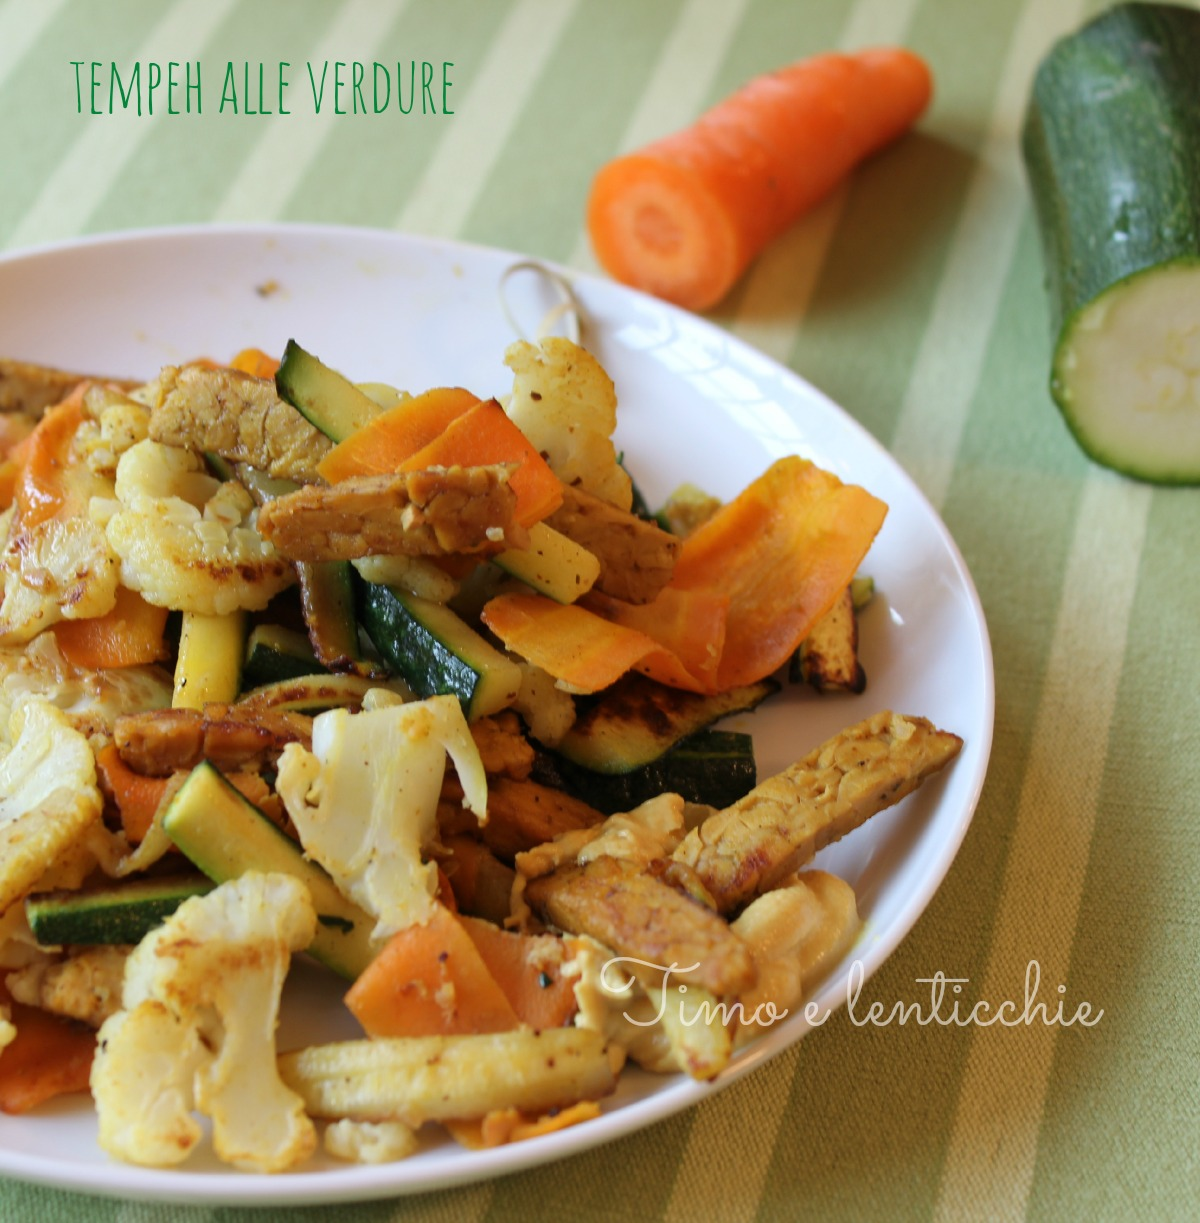 tempeh verdure 1200